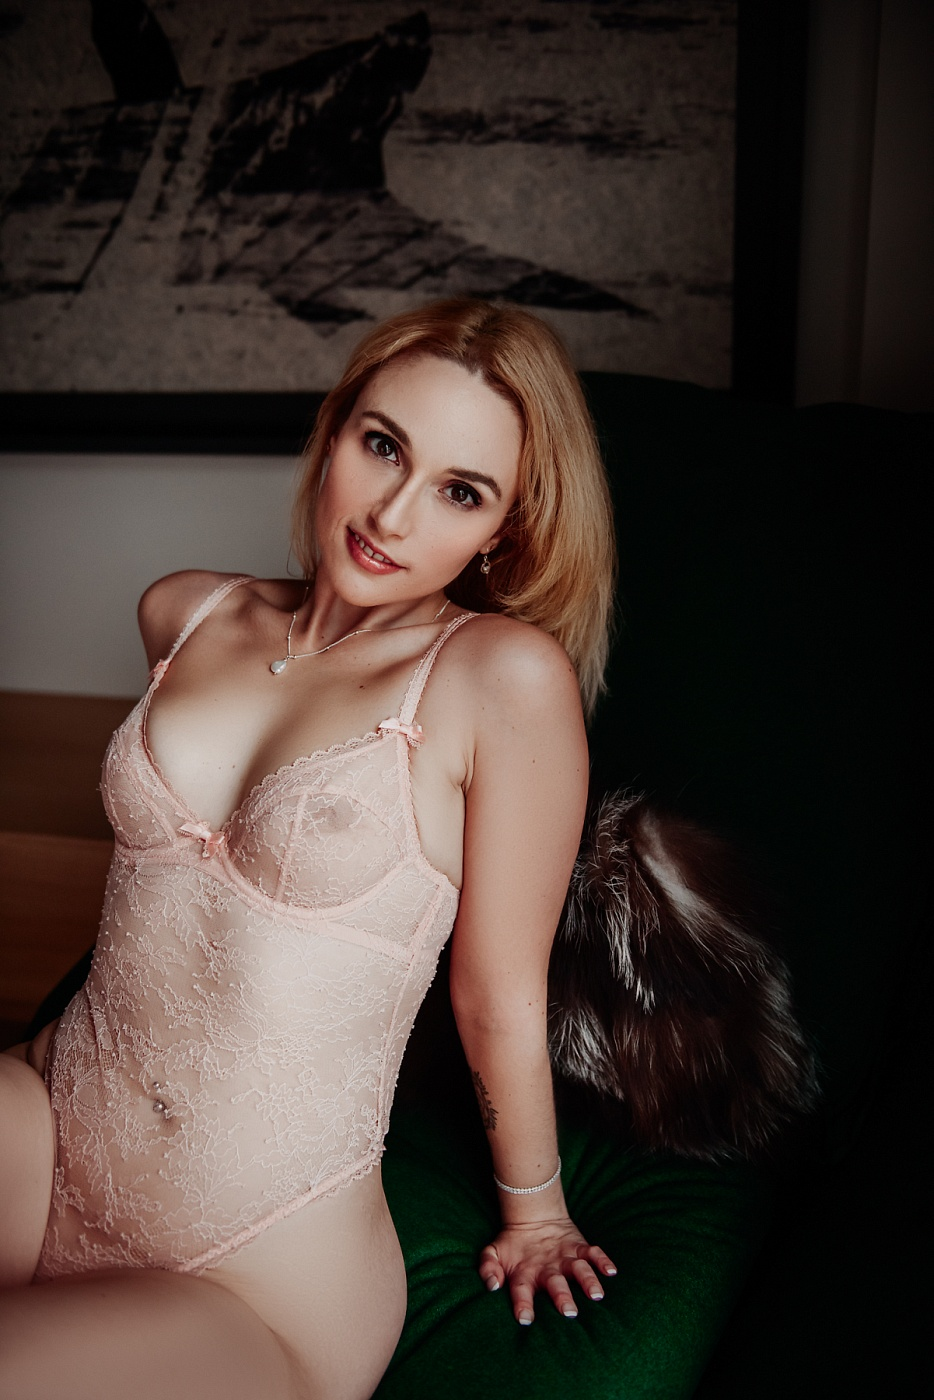 Elizabeth Weisz